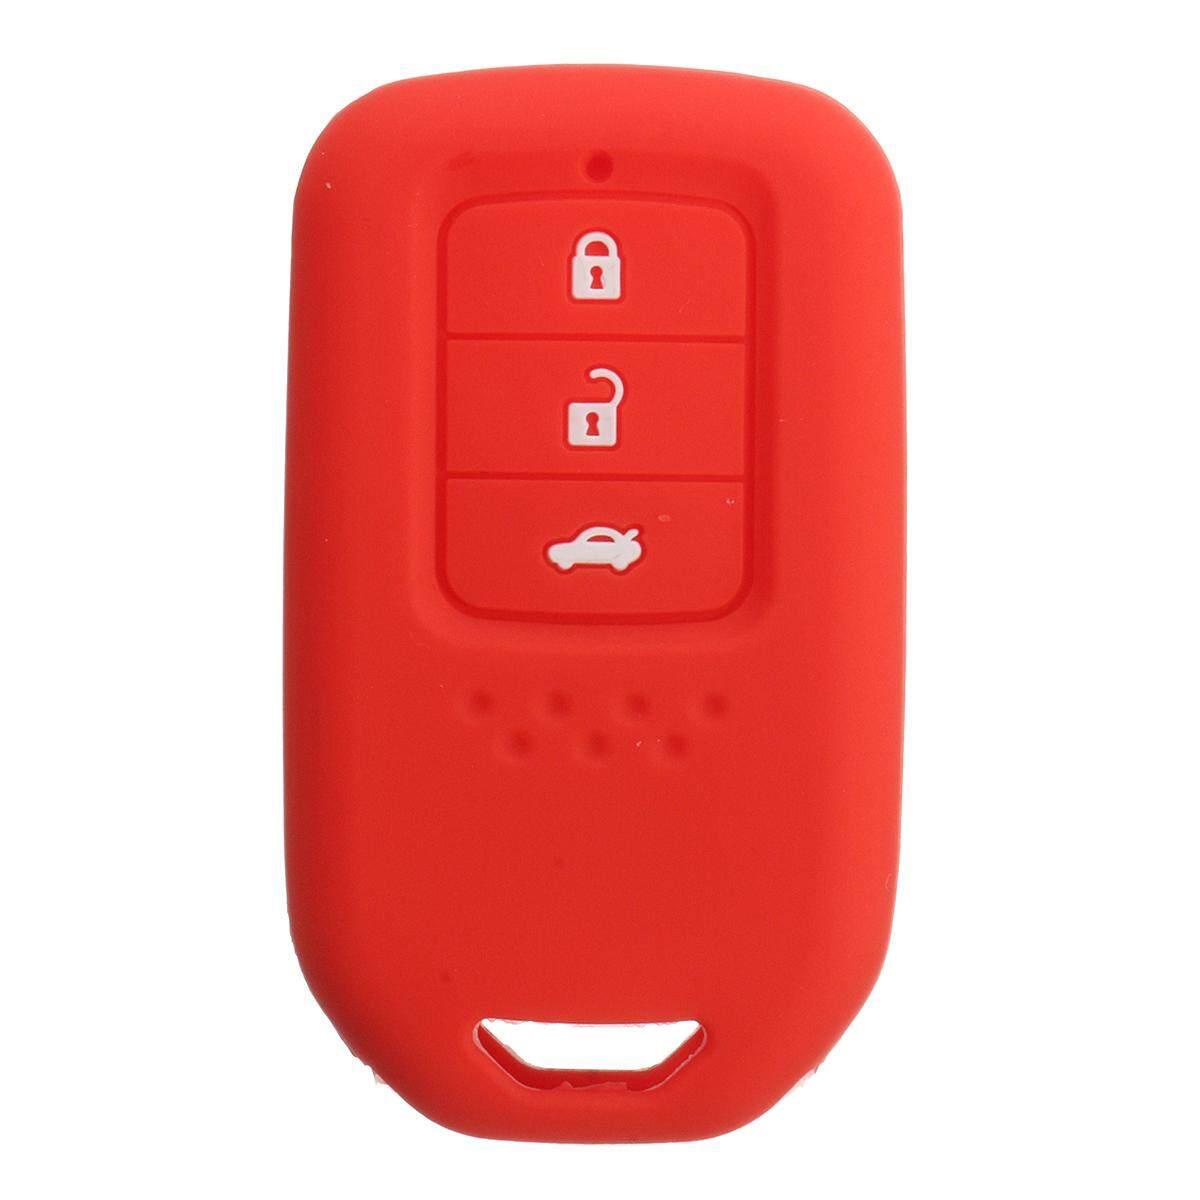 Rp 50000 2 3 Tombol Pintar Silikon Kunci Sarung Fob Kulit Cocok Untuk Honda Giok VEZEL HRV Crider Merah InternasionalIDR50000